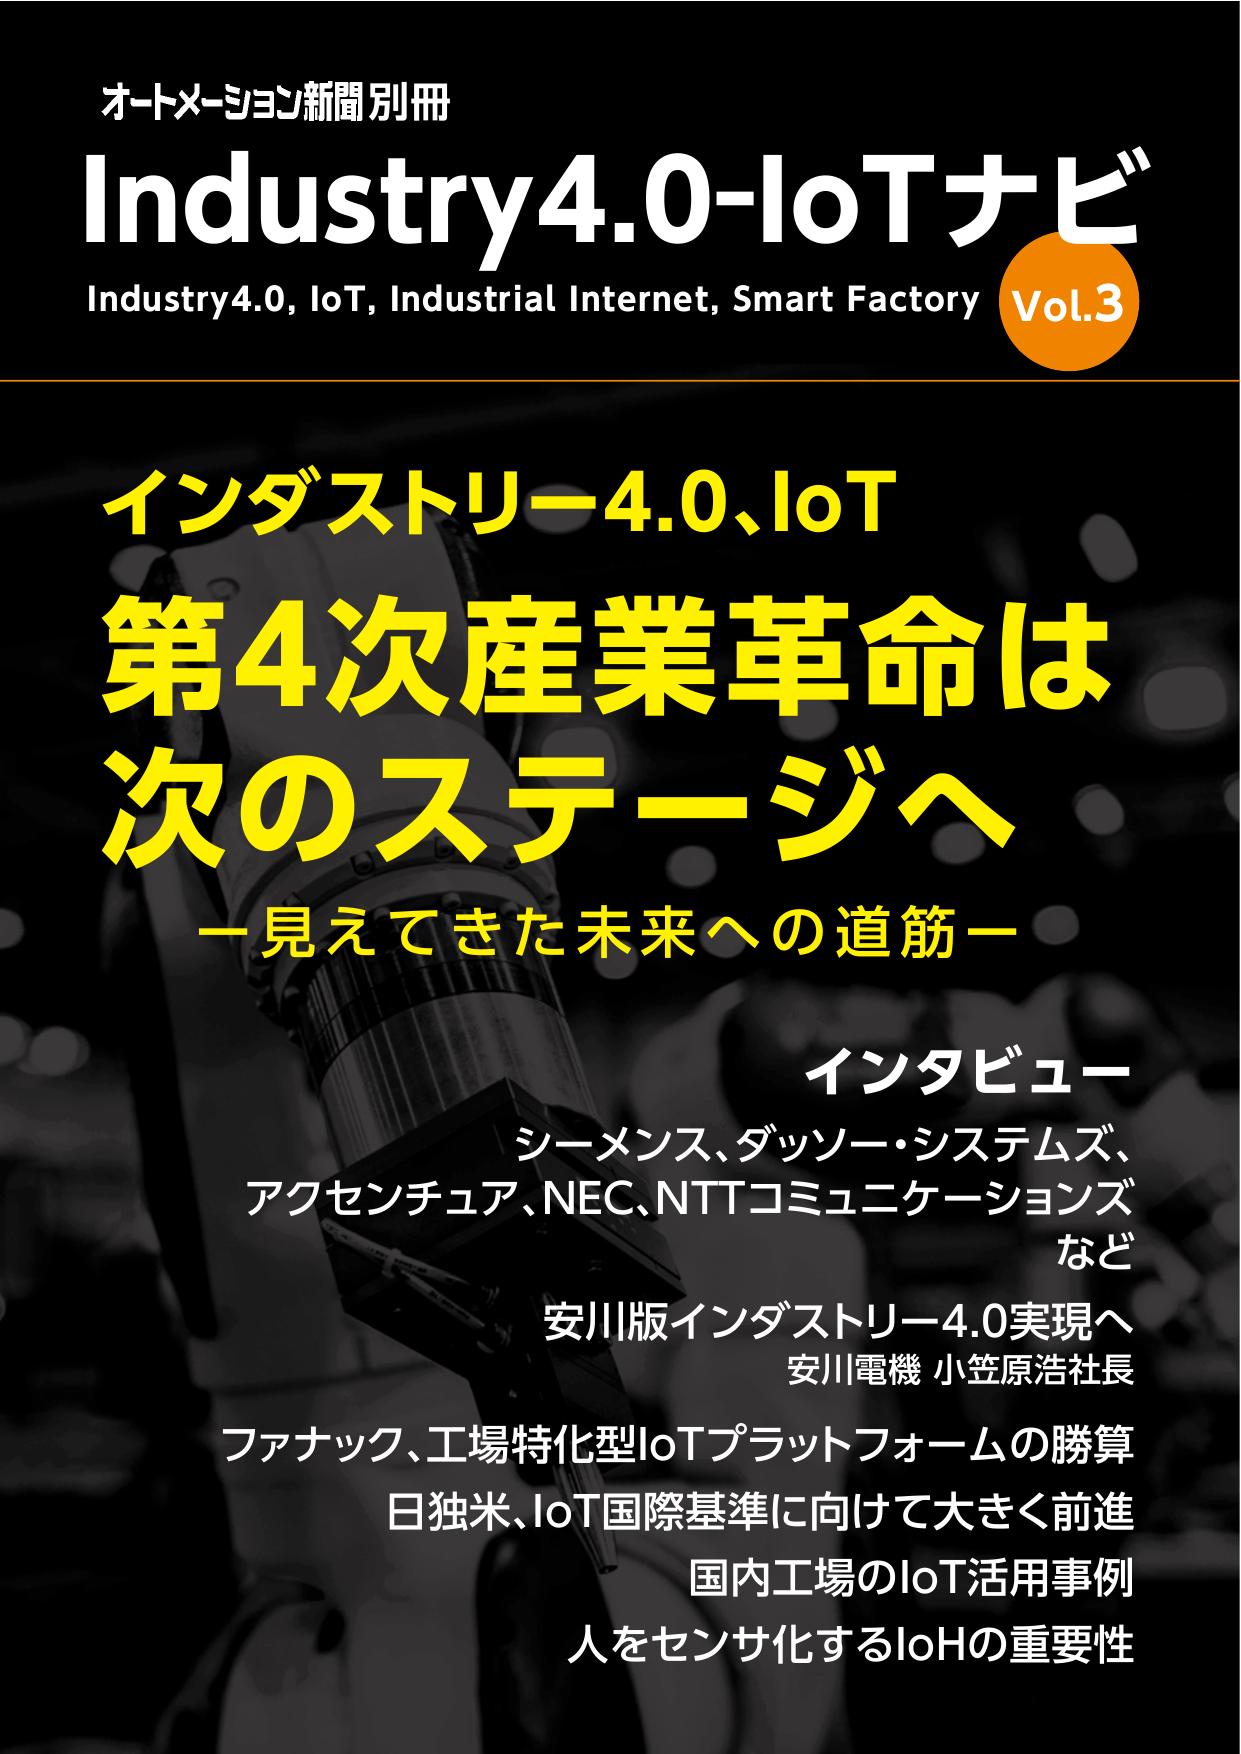 Industry4.0・IoTナビVol.3ダイジェスト版